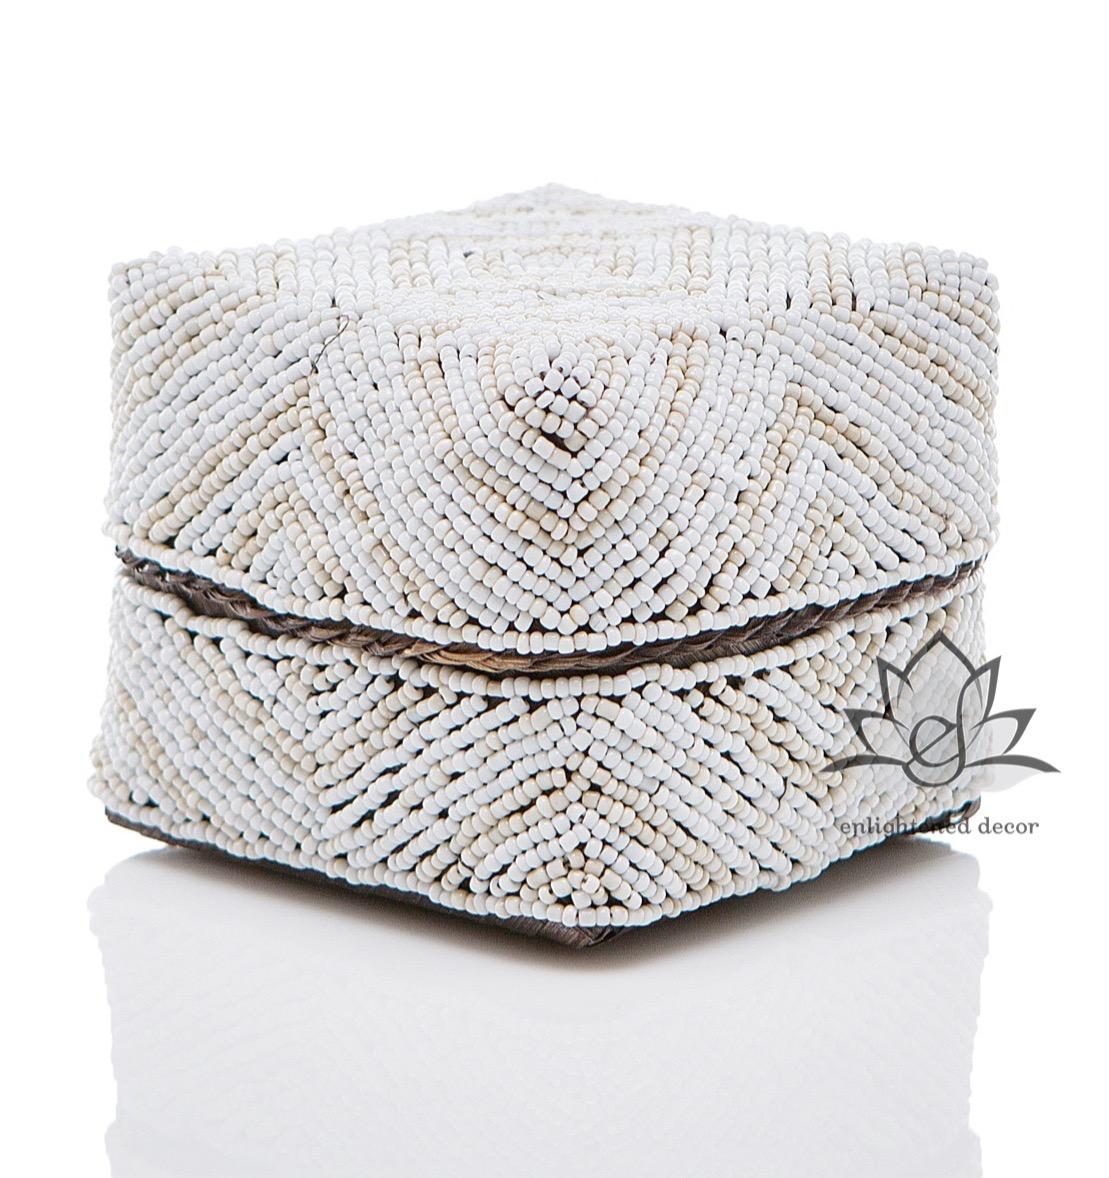 #60-2 Beaded Box, 10cm, Layered Diamond